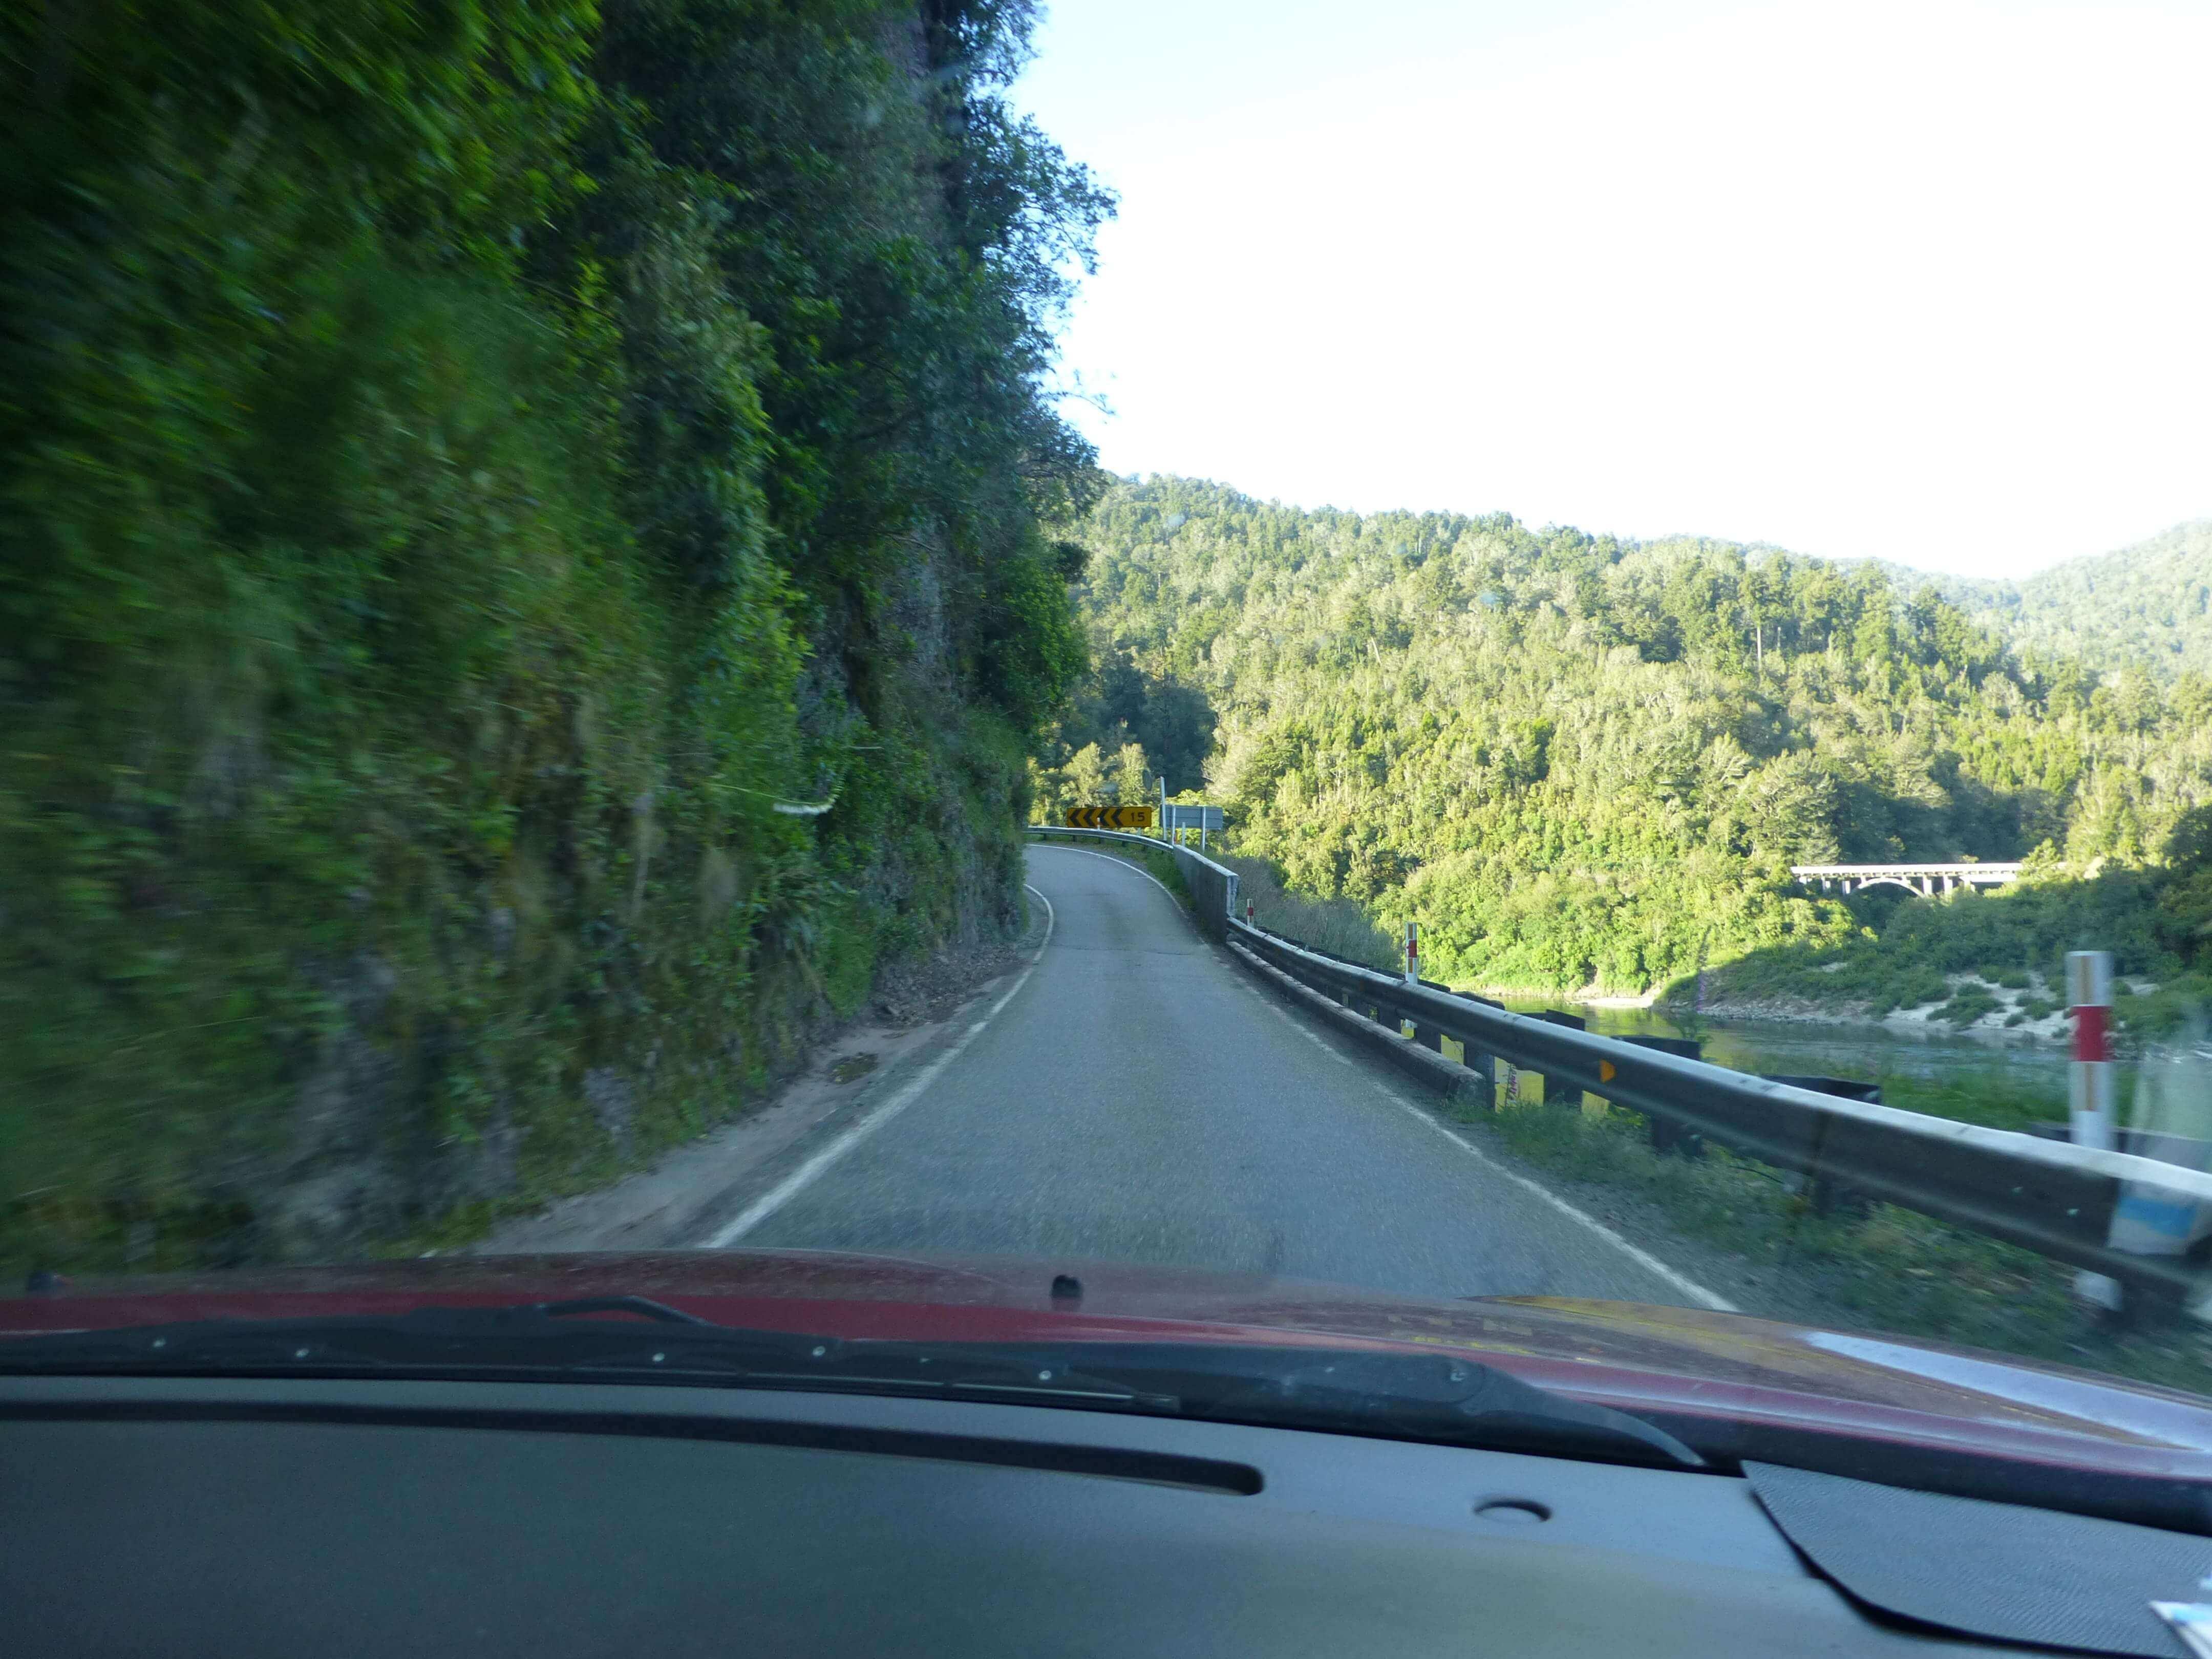 am Kilkenny Lookout, S6, Buller River, NZ 3